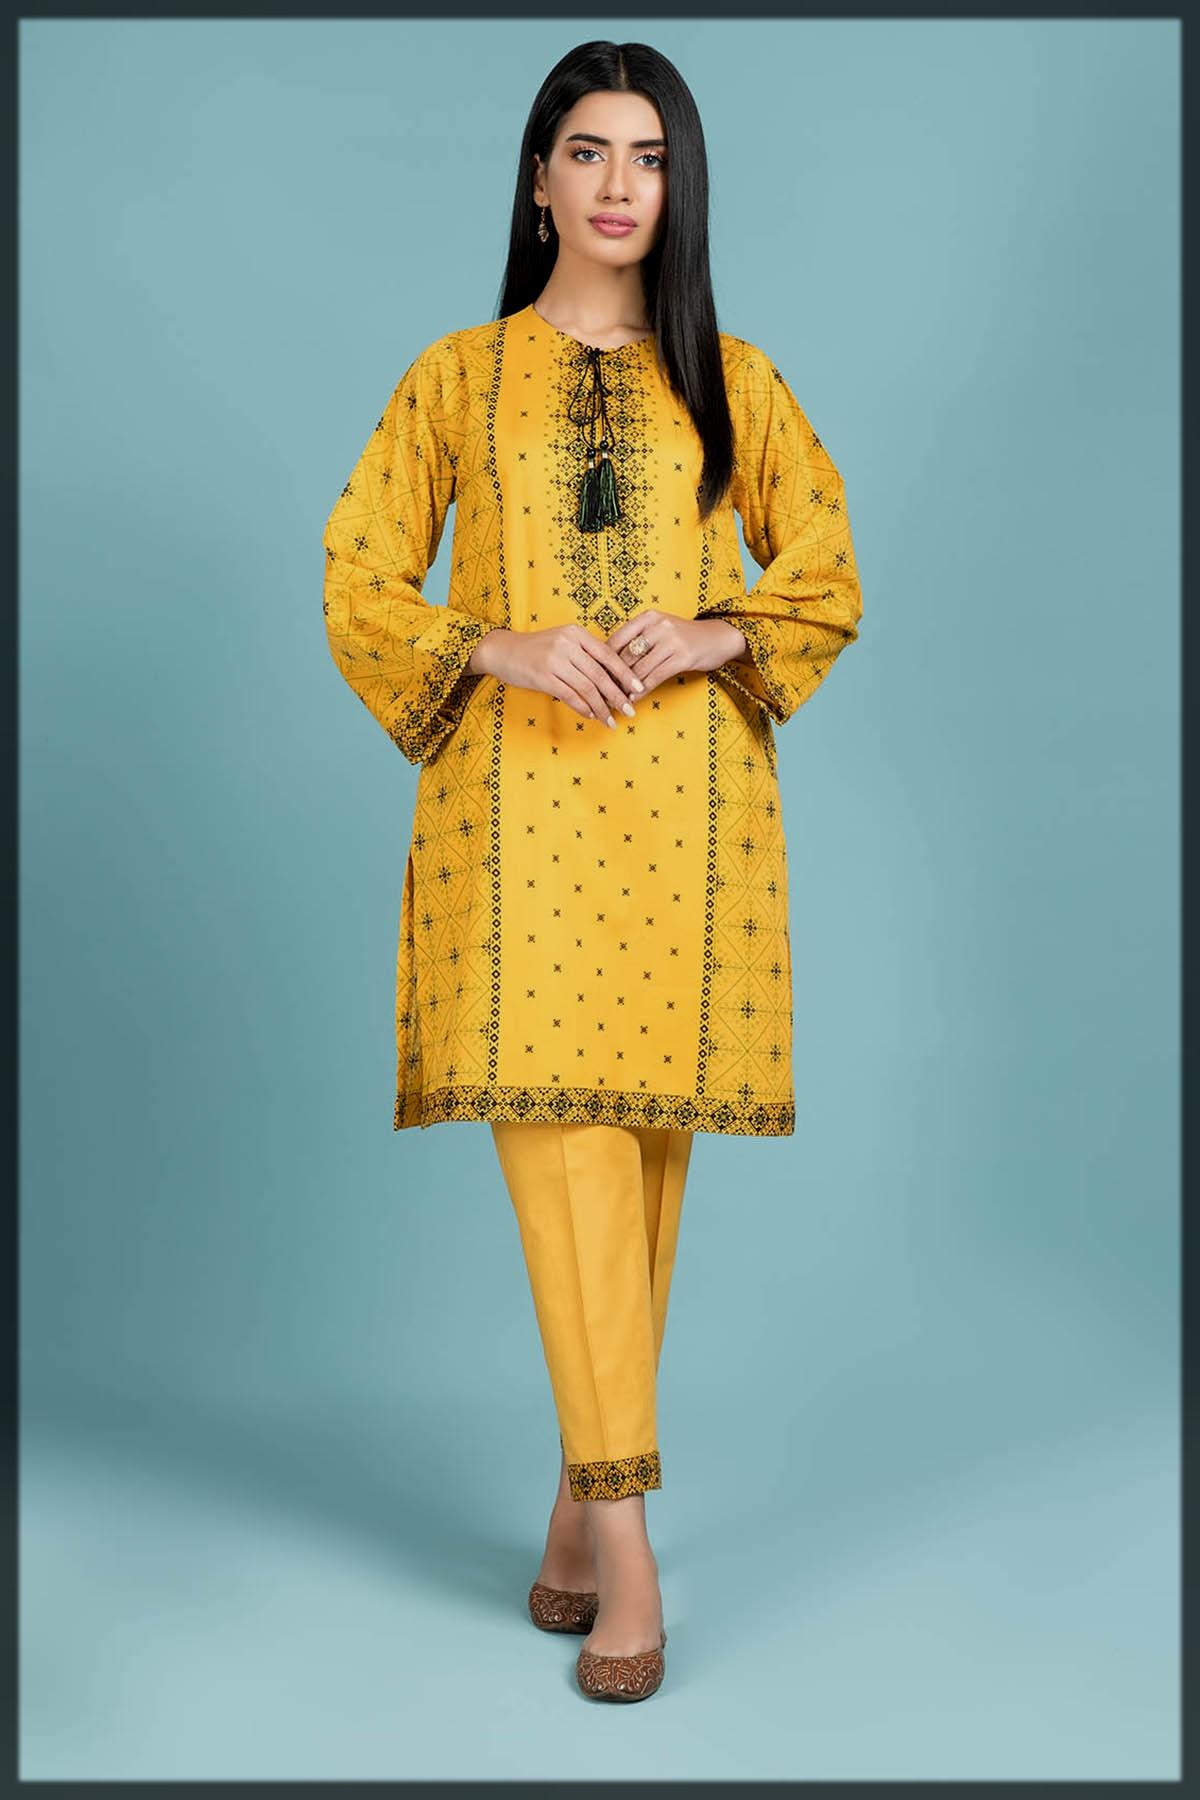 stunning yellow summer suit